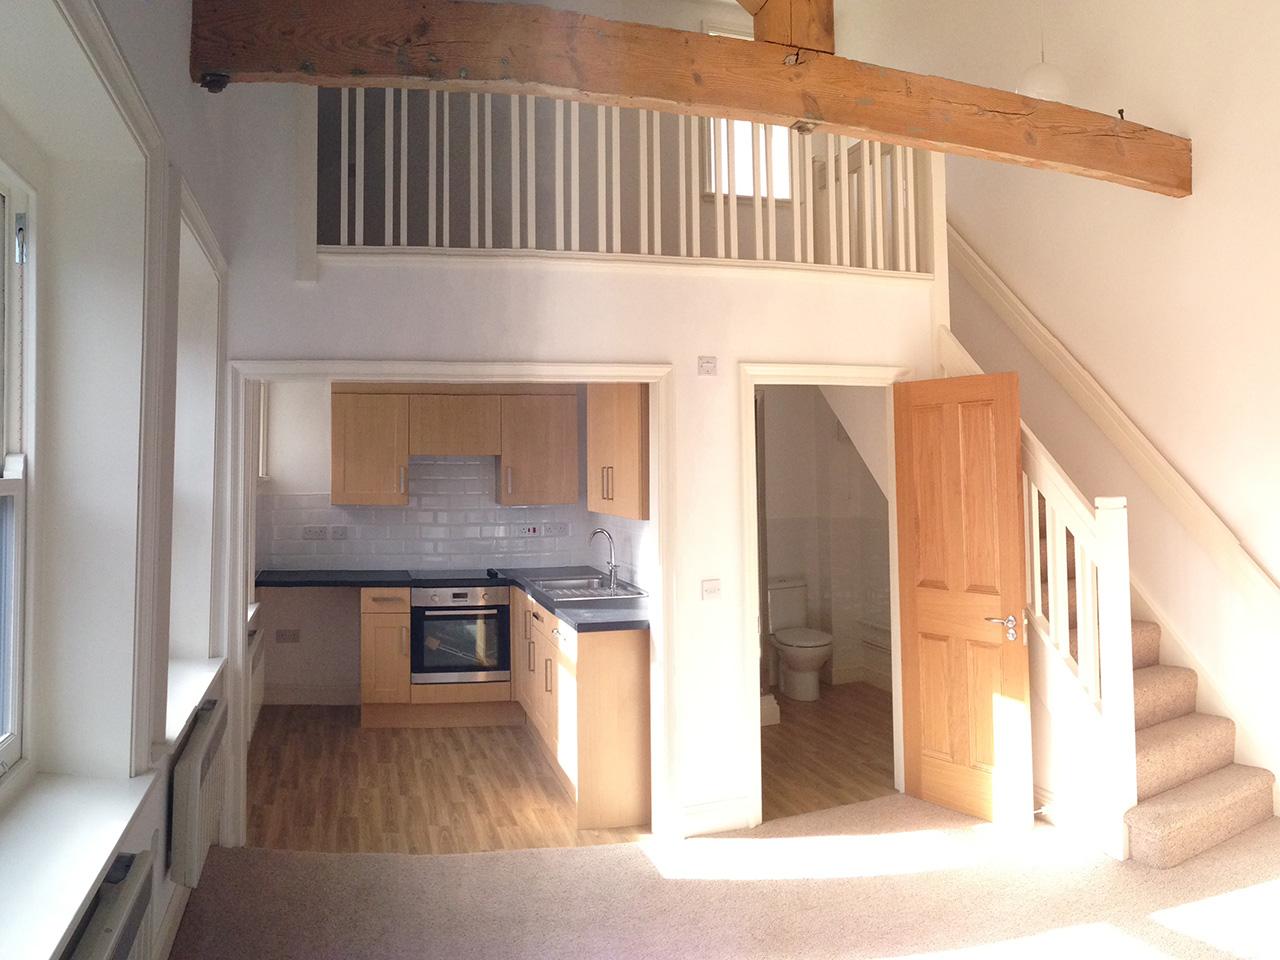 Mezzanine flooring c wood son for Wood mezzanine construction plan